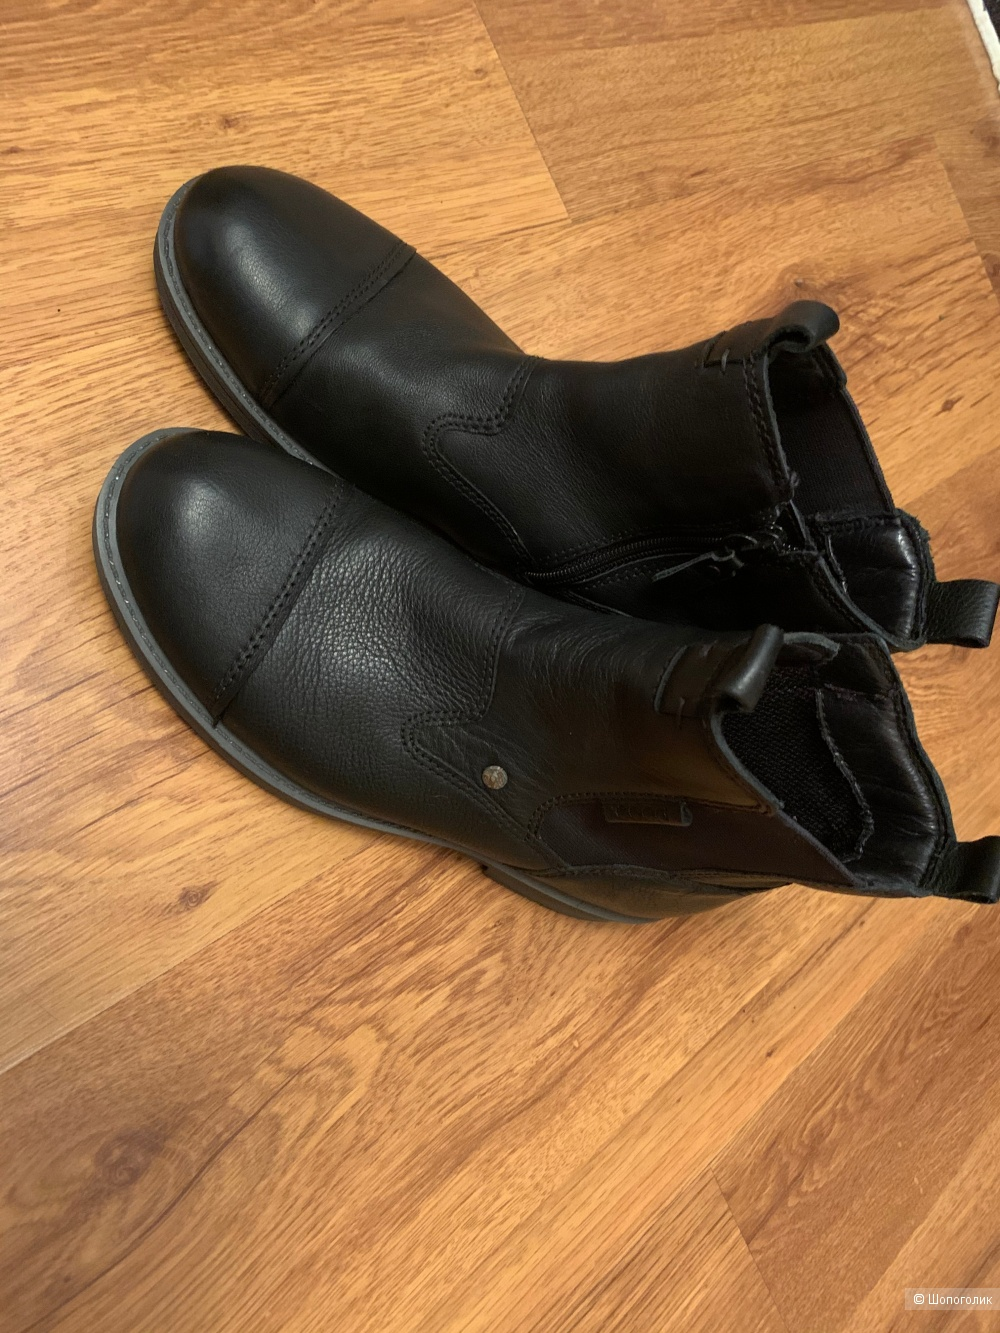 Ботинки ECCO р-р 37-38 женские